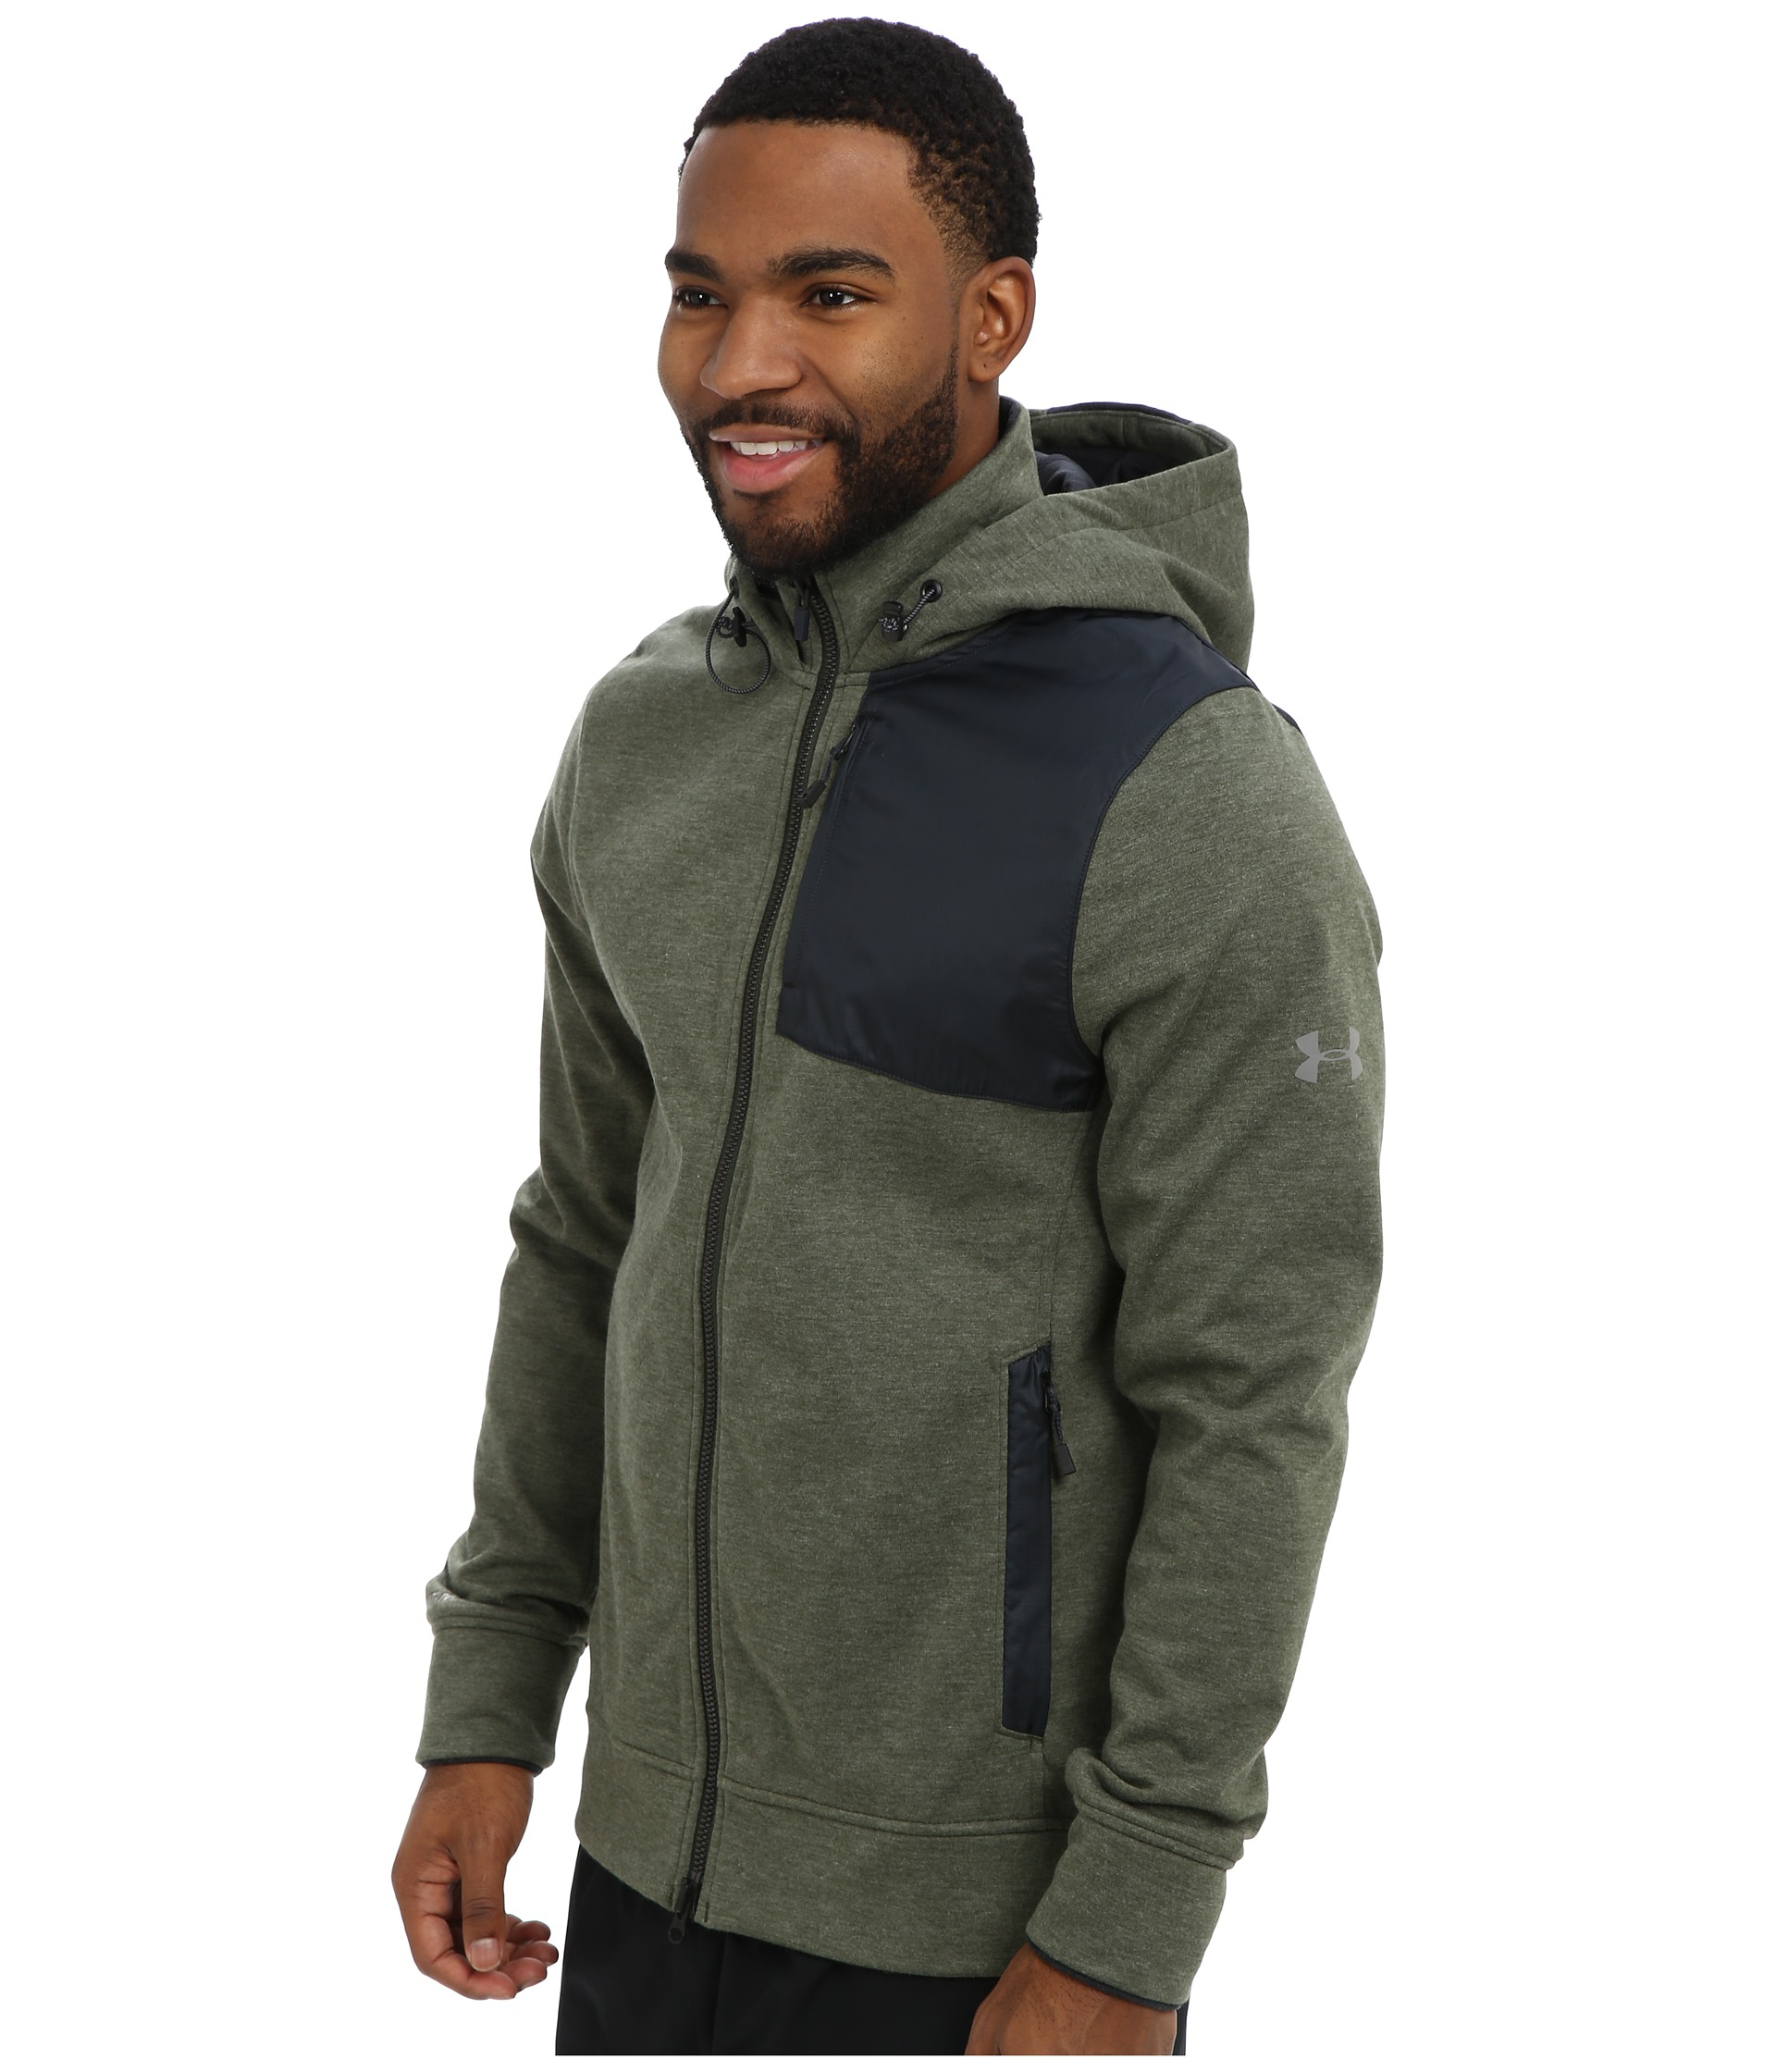 lyst under armour ua element breaker hoodie in gray for men. Black Bedroom Furniture Sets. Home Design Ideas